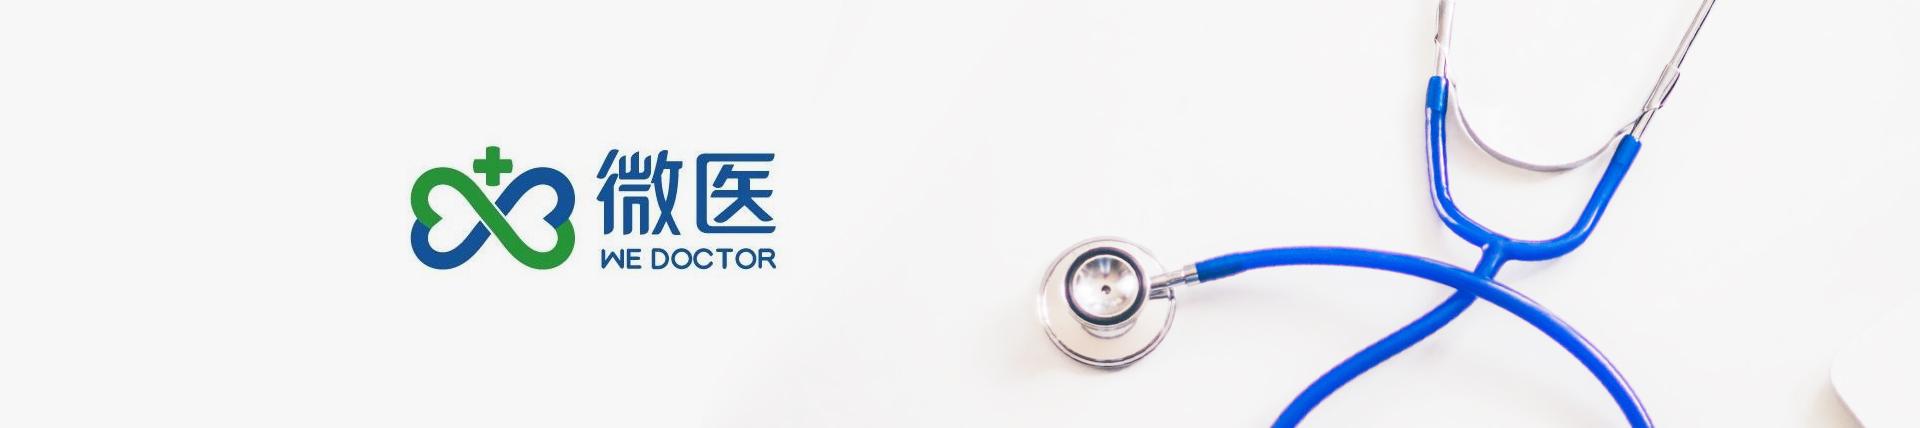 微医计划IPO,是否将换下guahao.com?